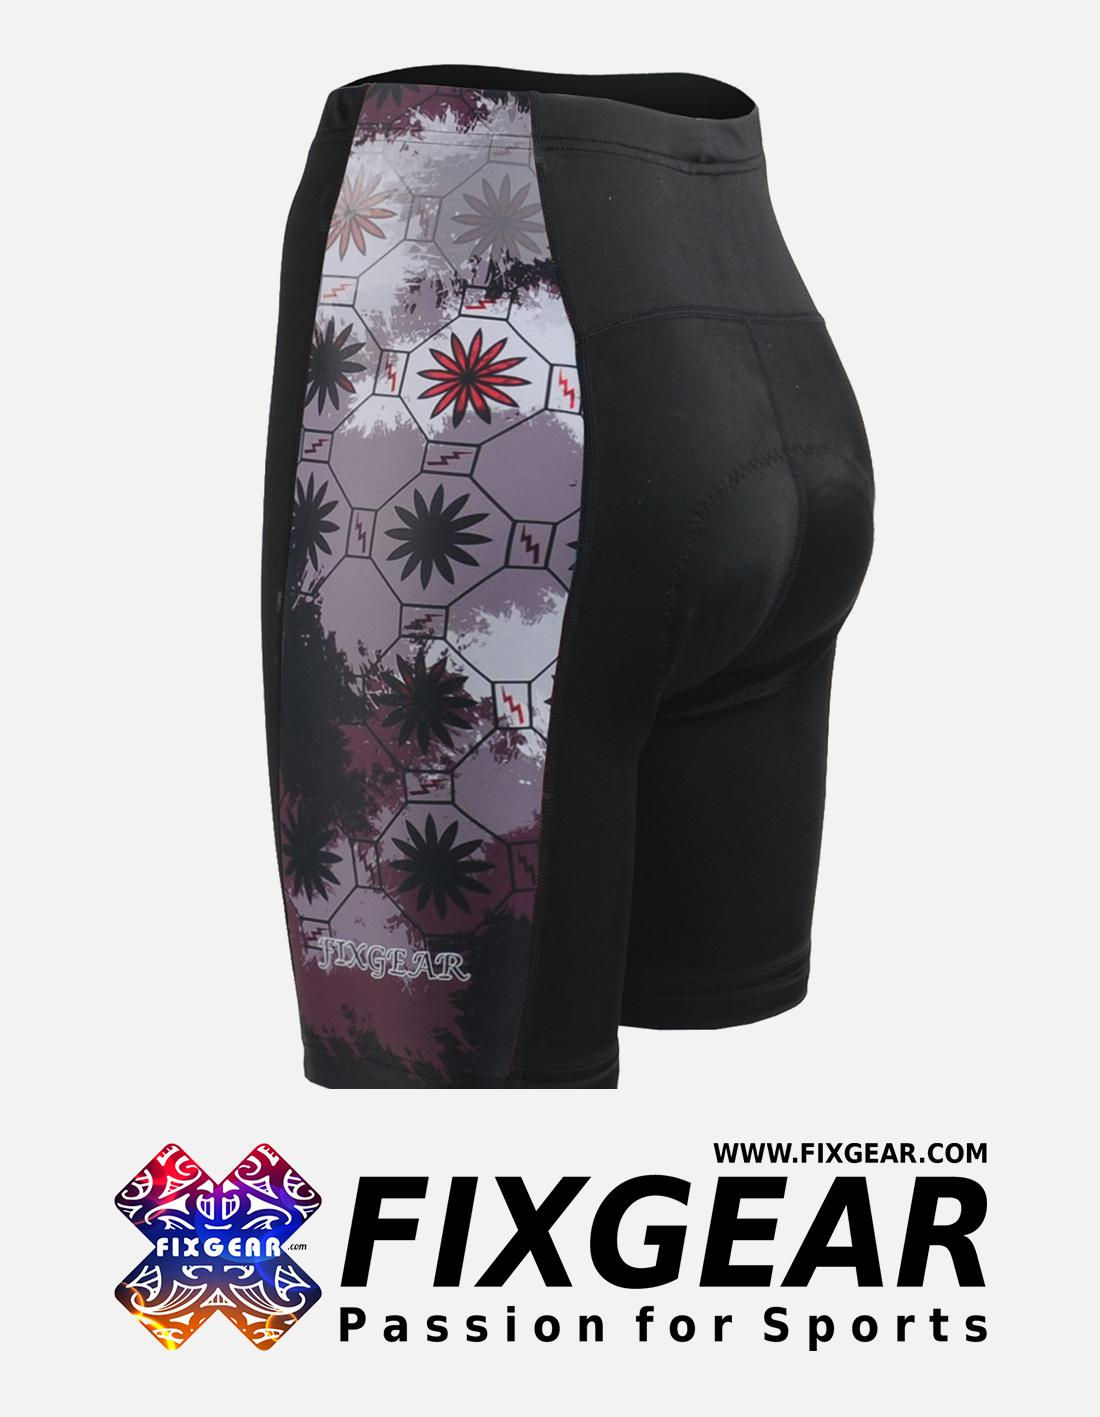 FIXGEAR ST-WJ4 Women's Cycling Padded Shorts